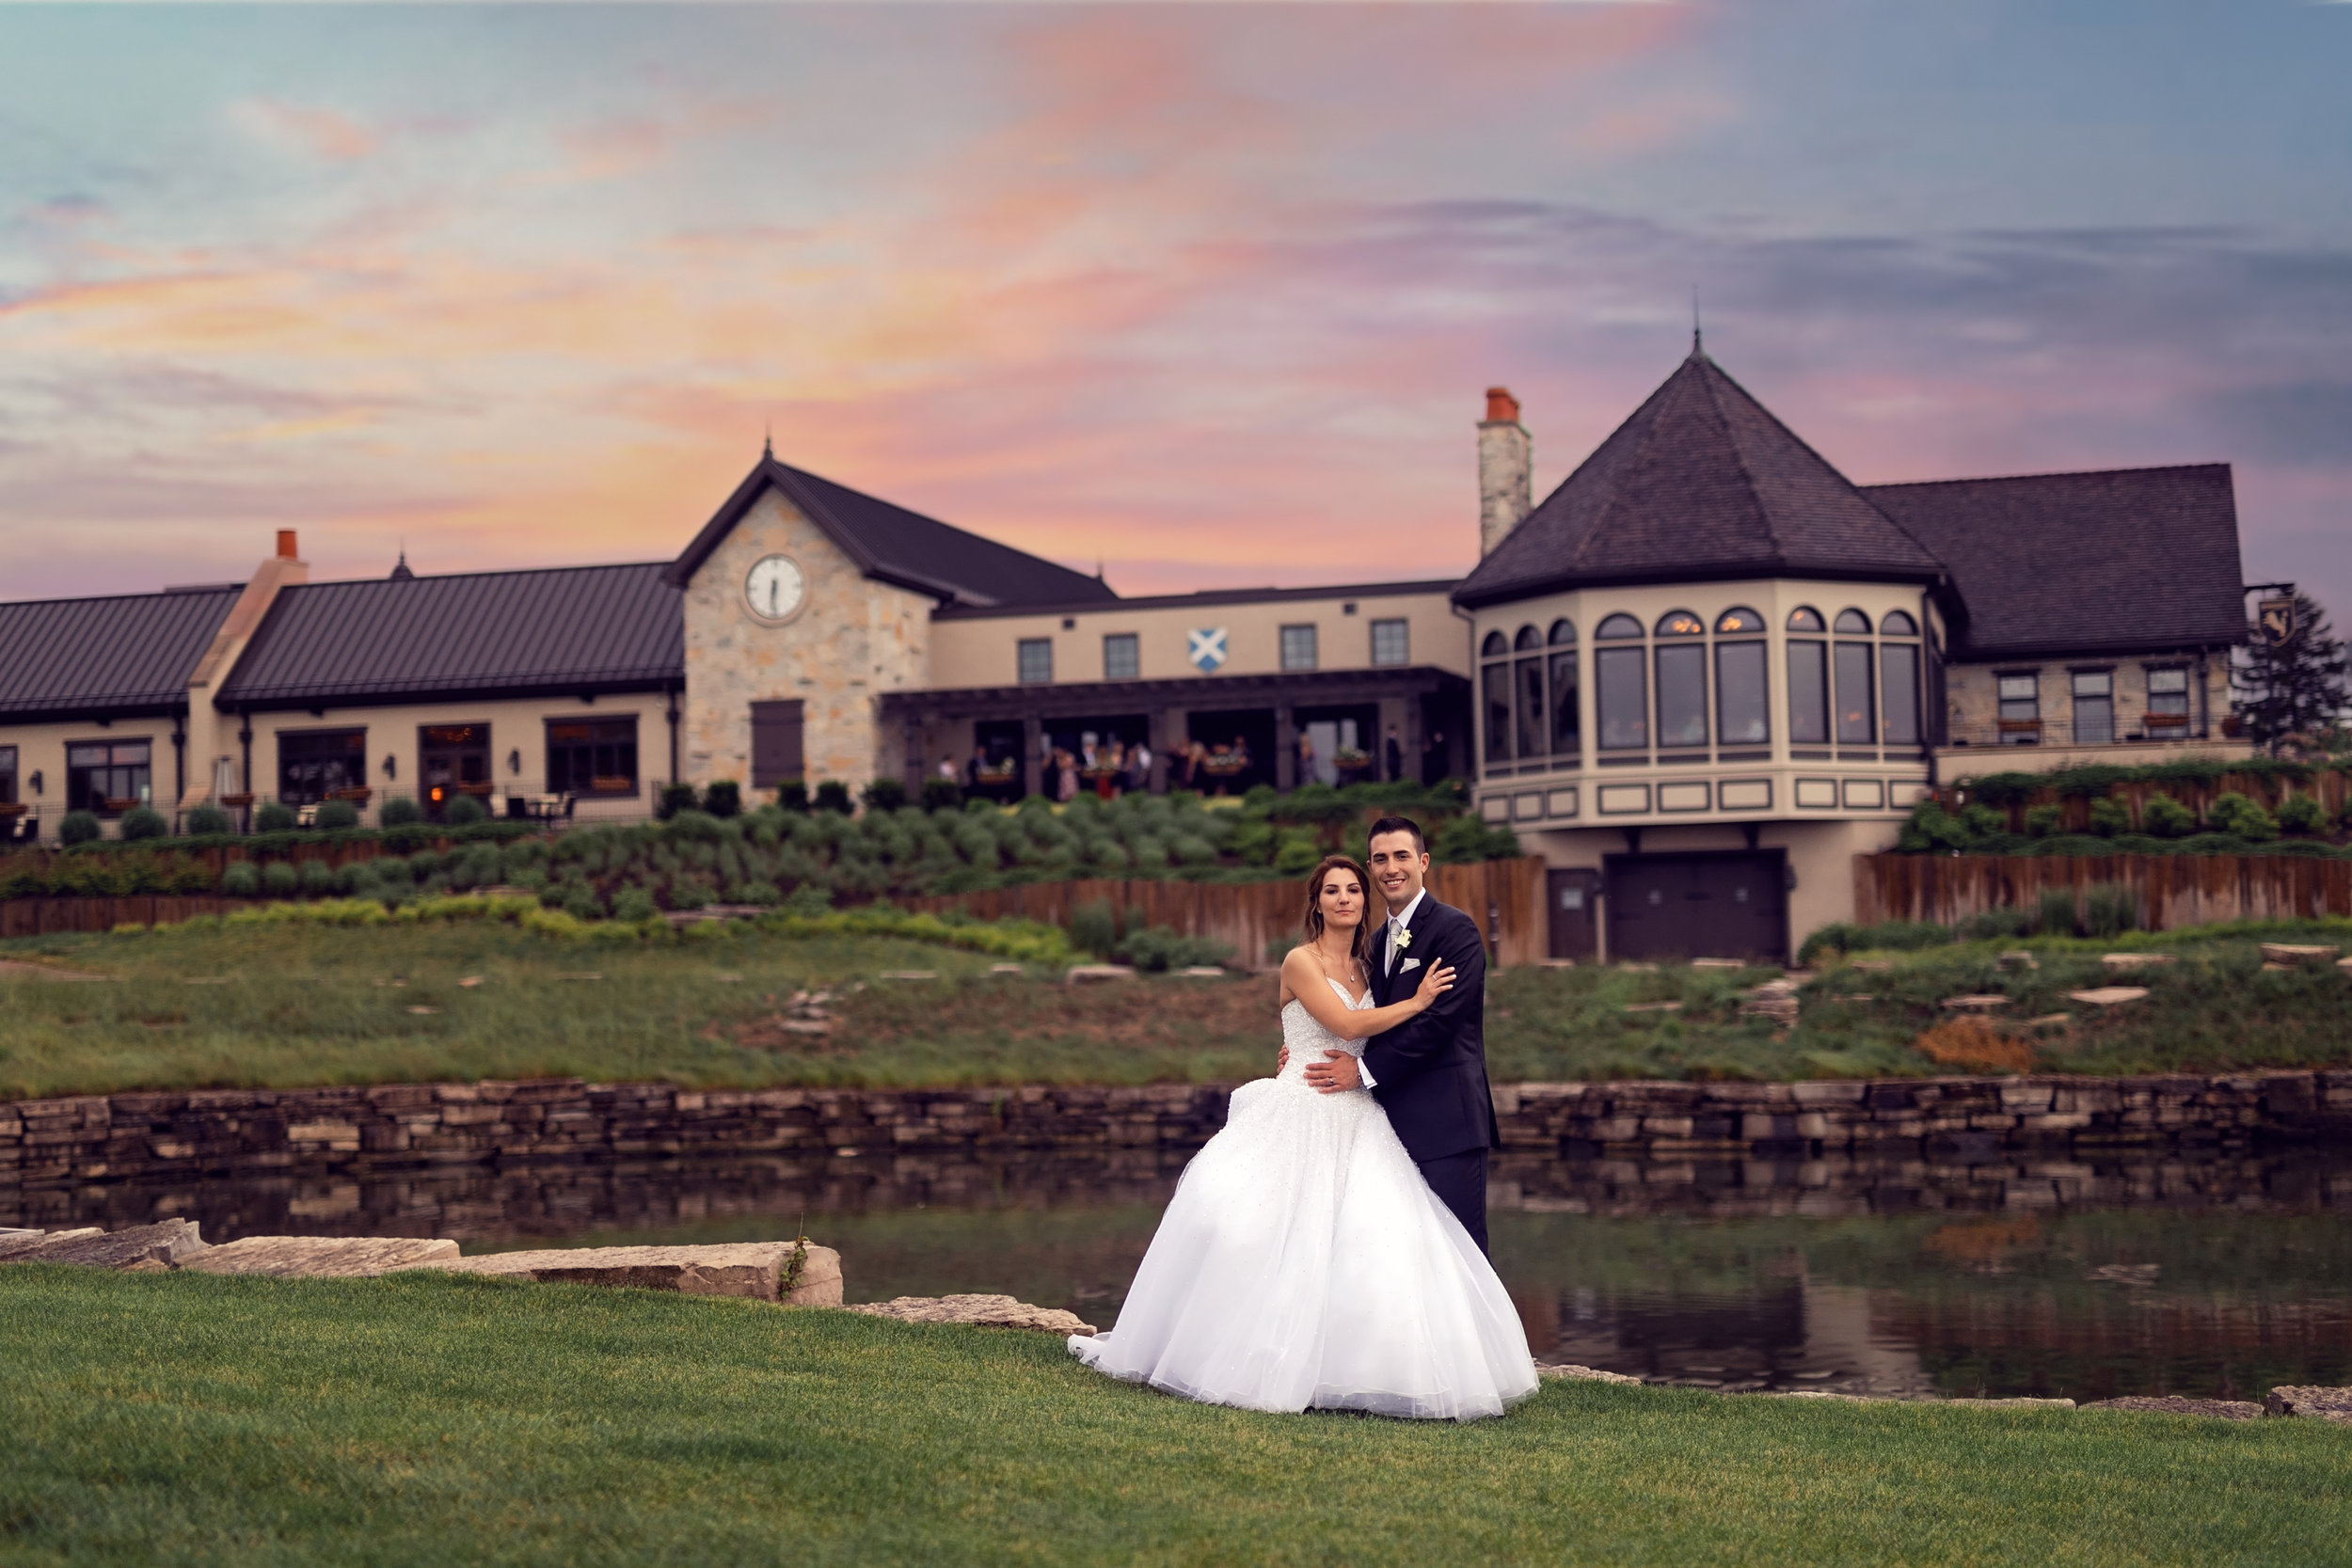 Wedding-couple-takes-photos-at-lowes-hardware-due-to-rain41.jpg